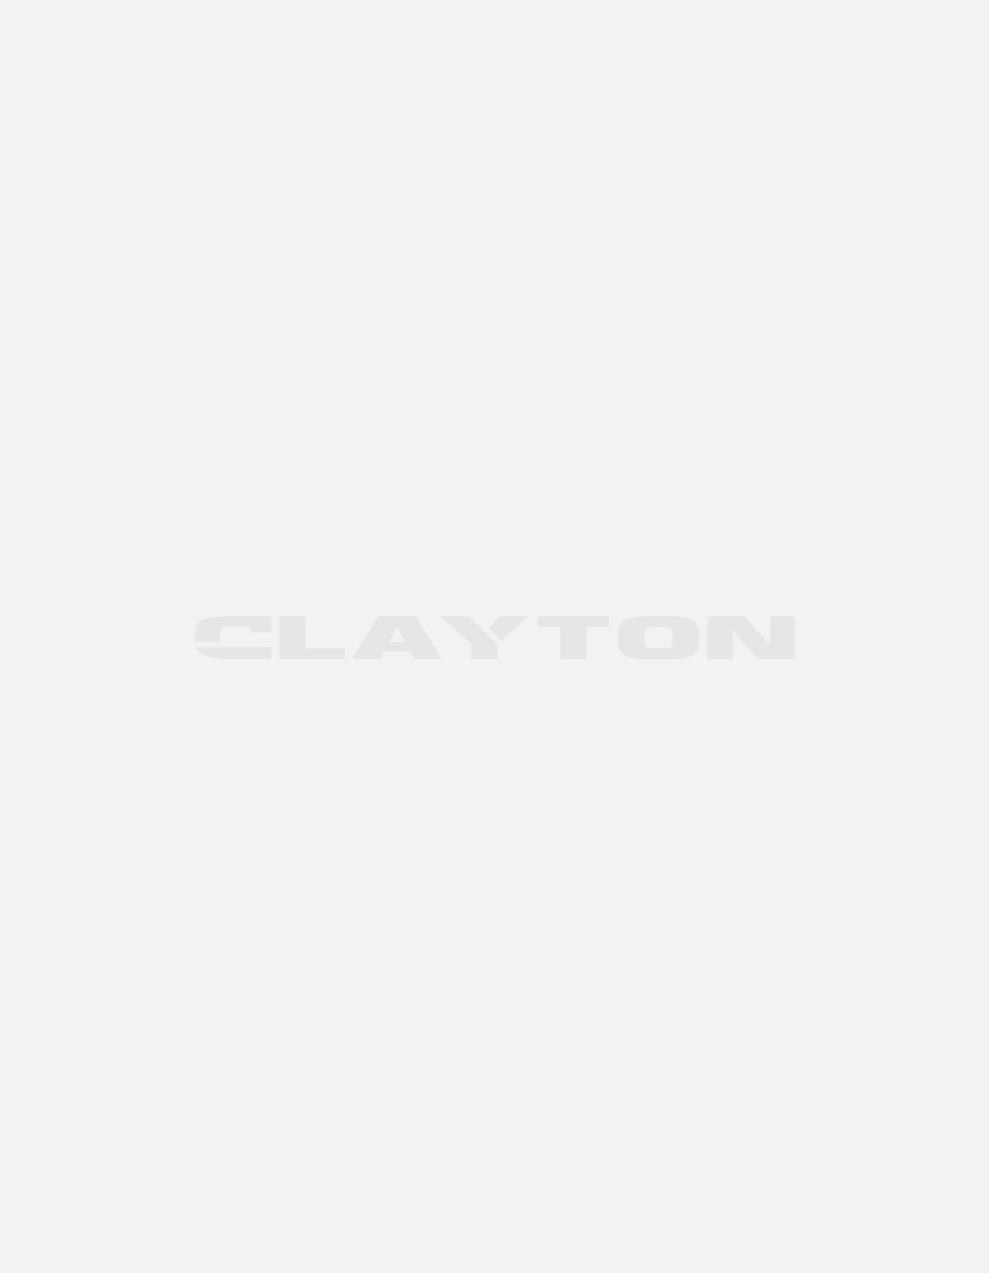 https://www.claytonitalia.com/media/catalog/product/cache/5/small_image/460x590/9df78eab33525d08d6e5fb8d27136e95/g/i/gift52_nt.jpg